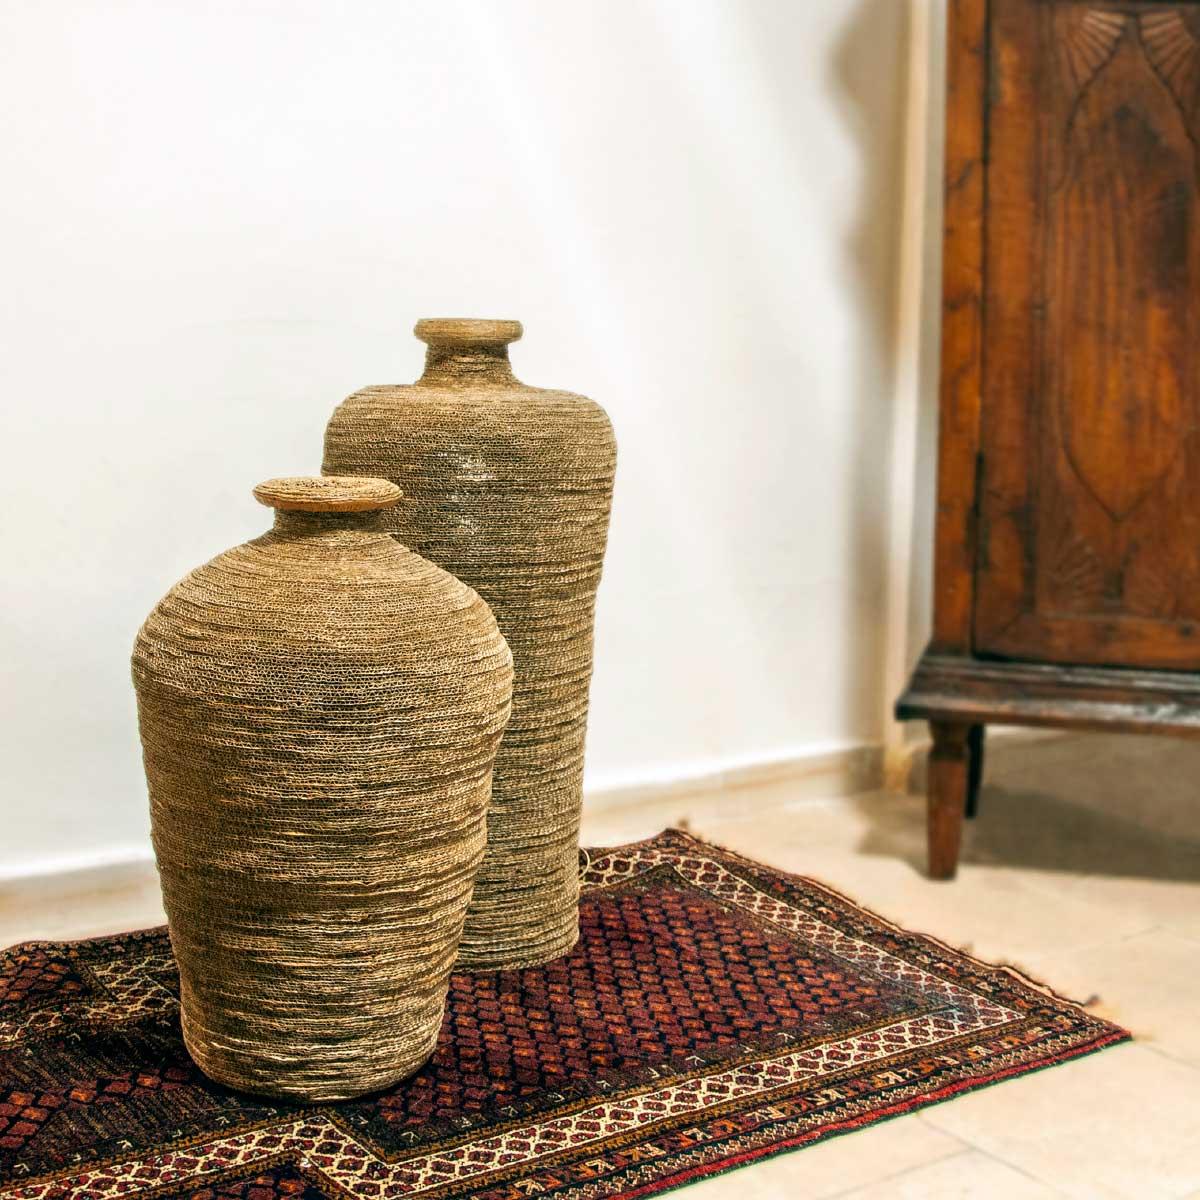 Lamp Aretusa Cardboard Alessandra Bray Italiano Plurale artist